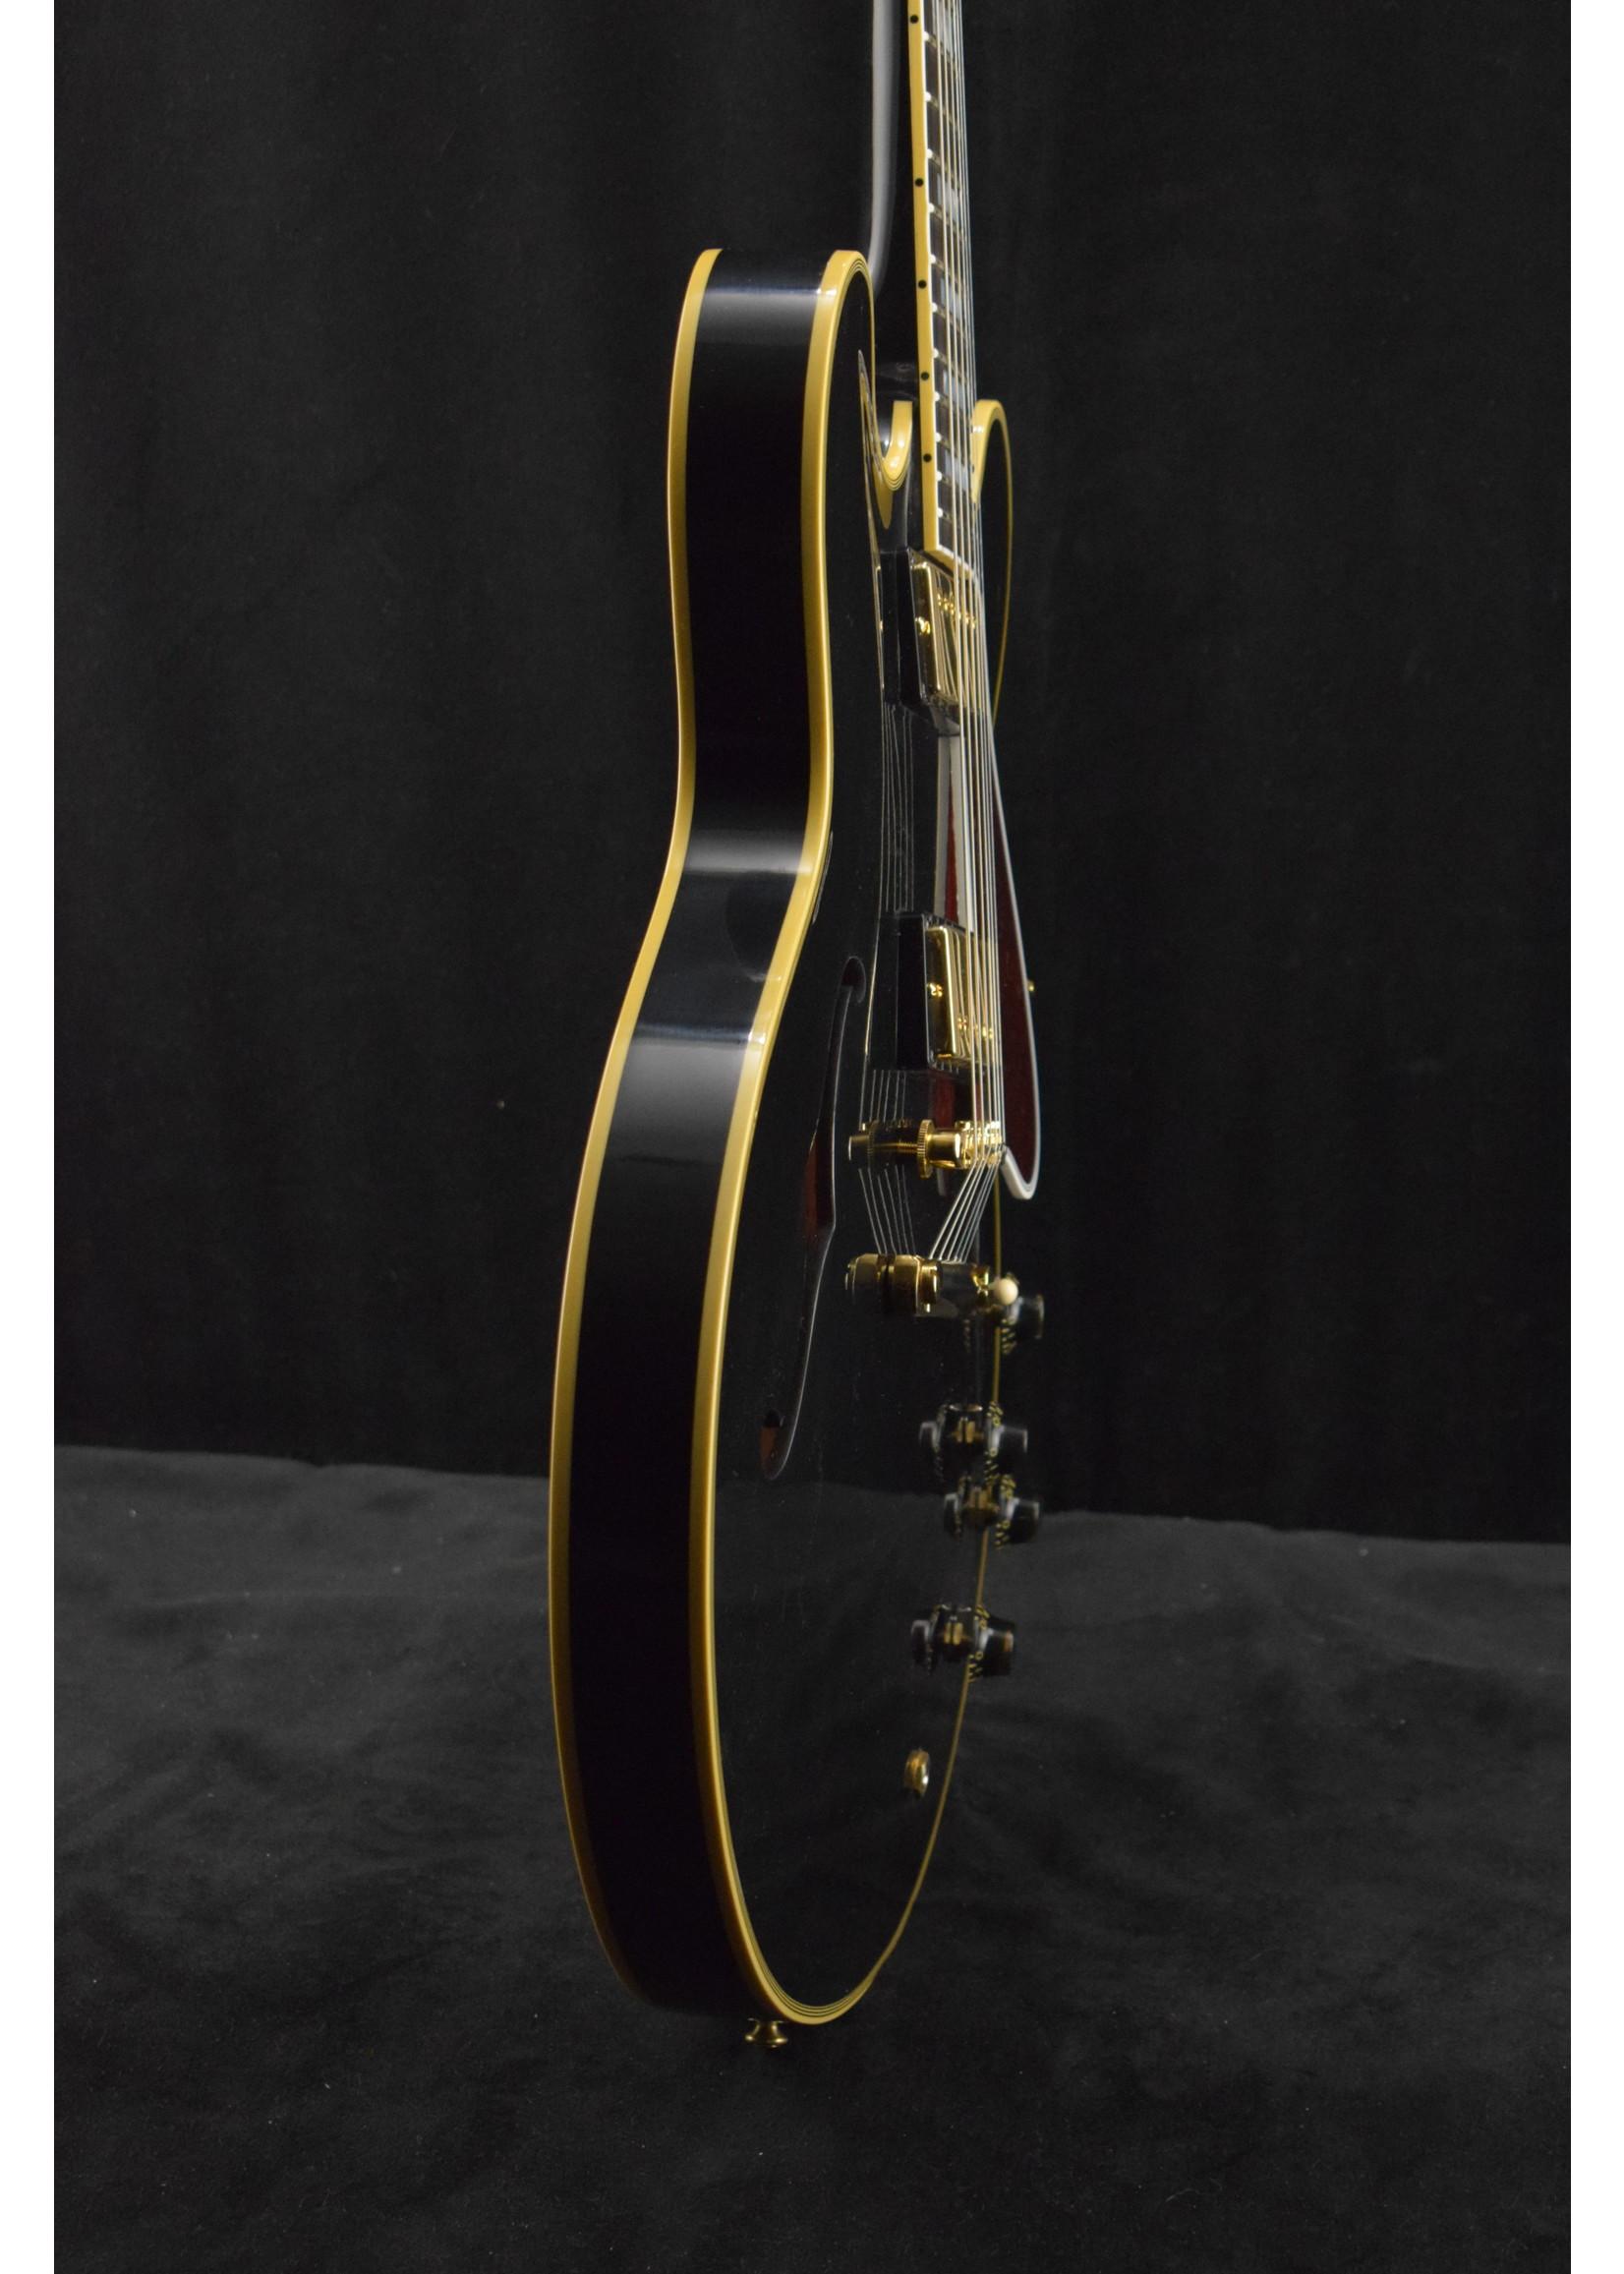 Gibson Gibson 1959 ES-355 Stop Bar Reissue Ebony VOS GH